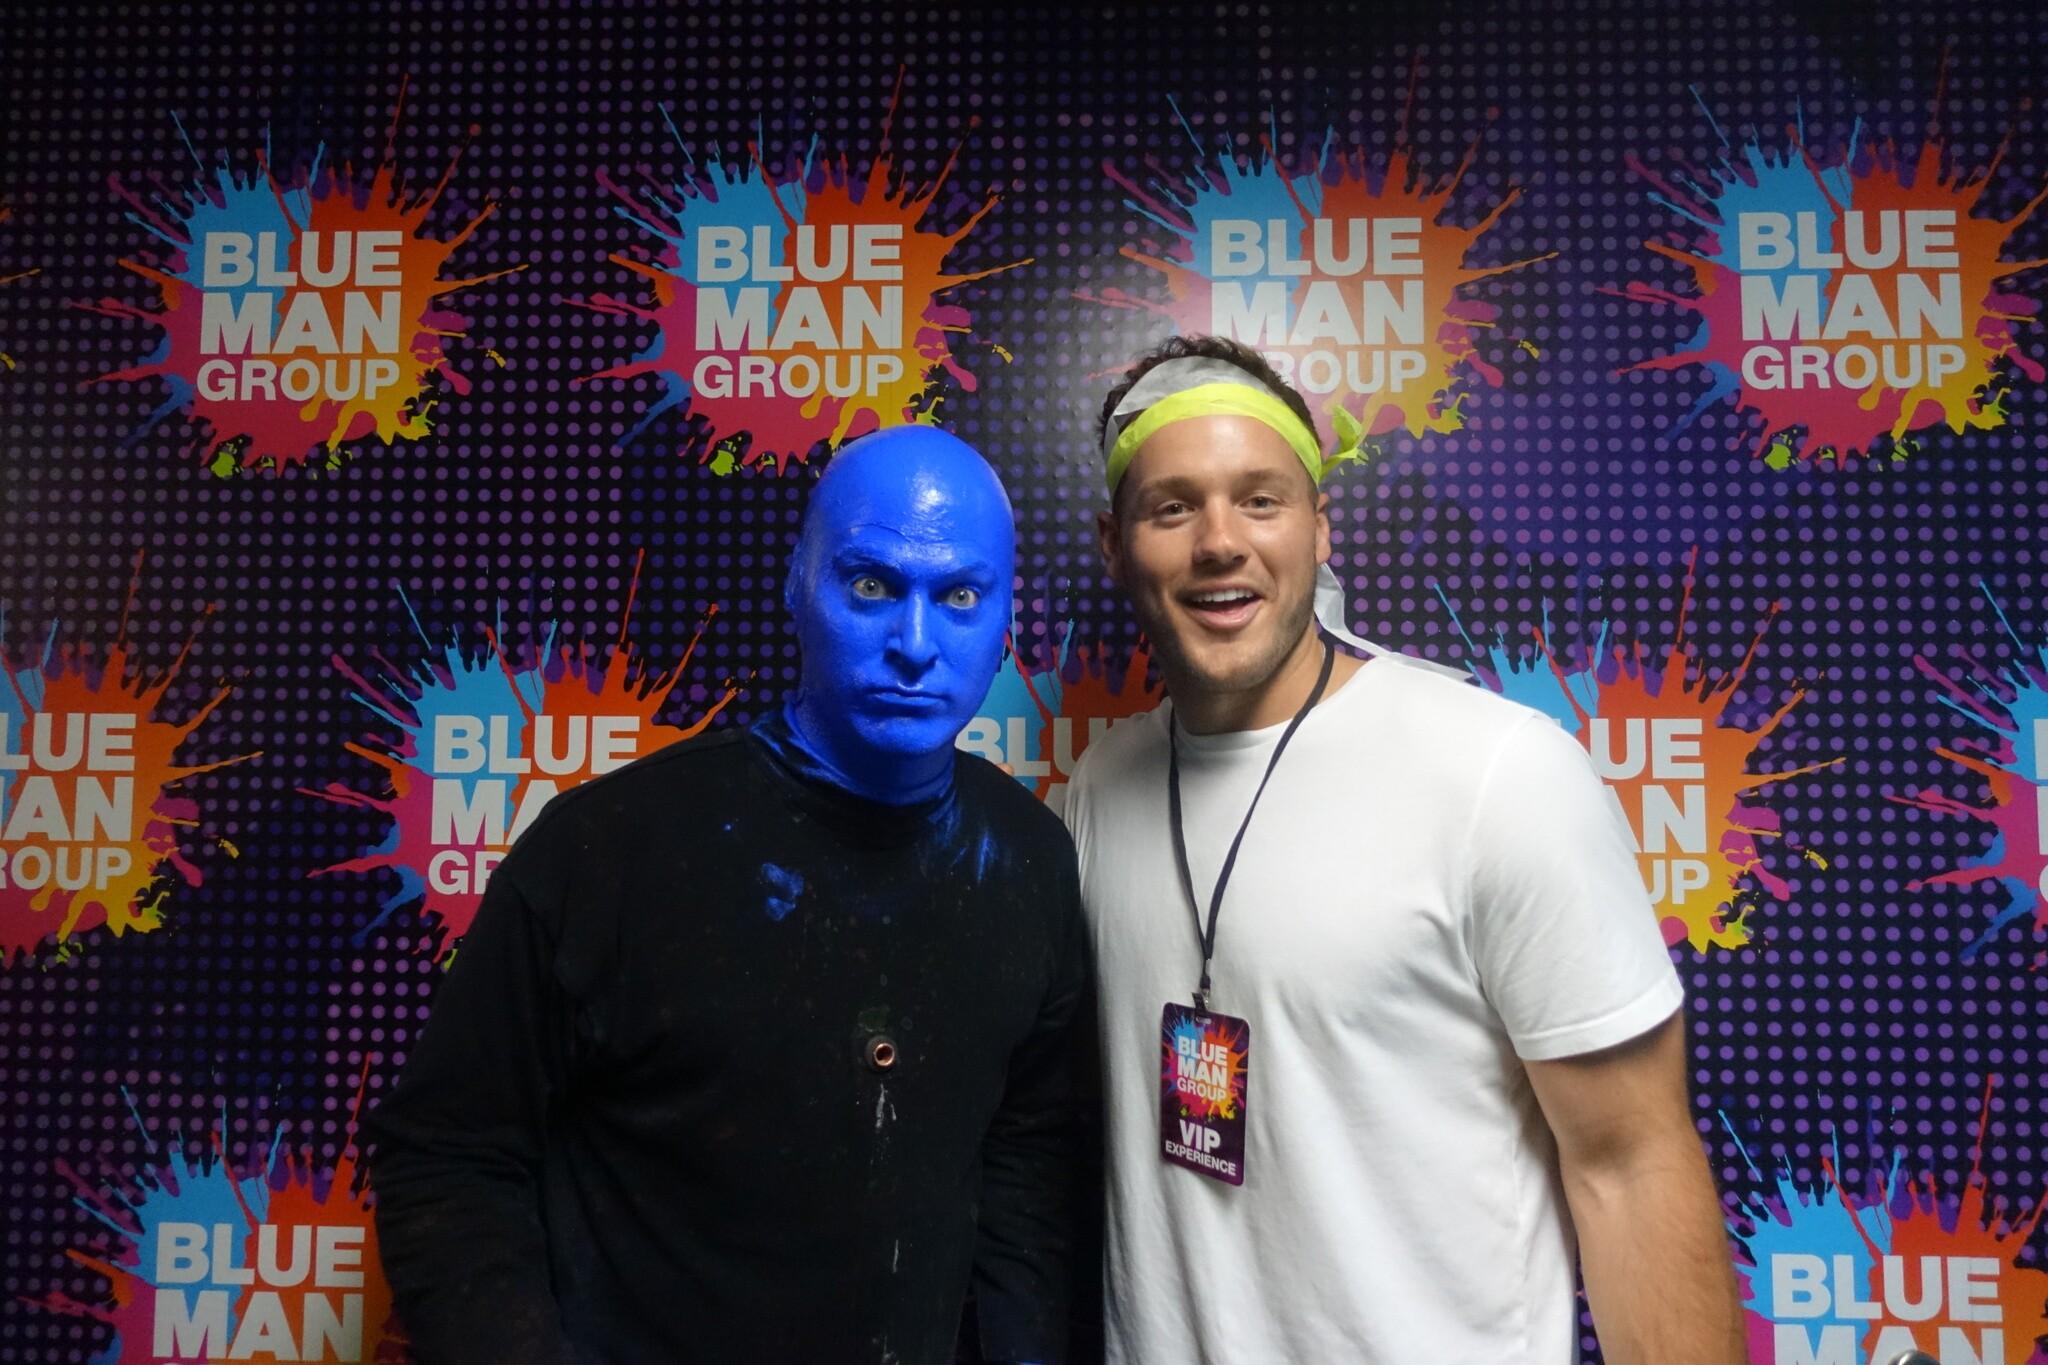 colton blue man file.jpg